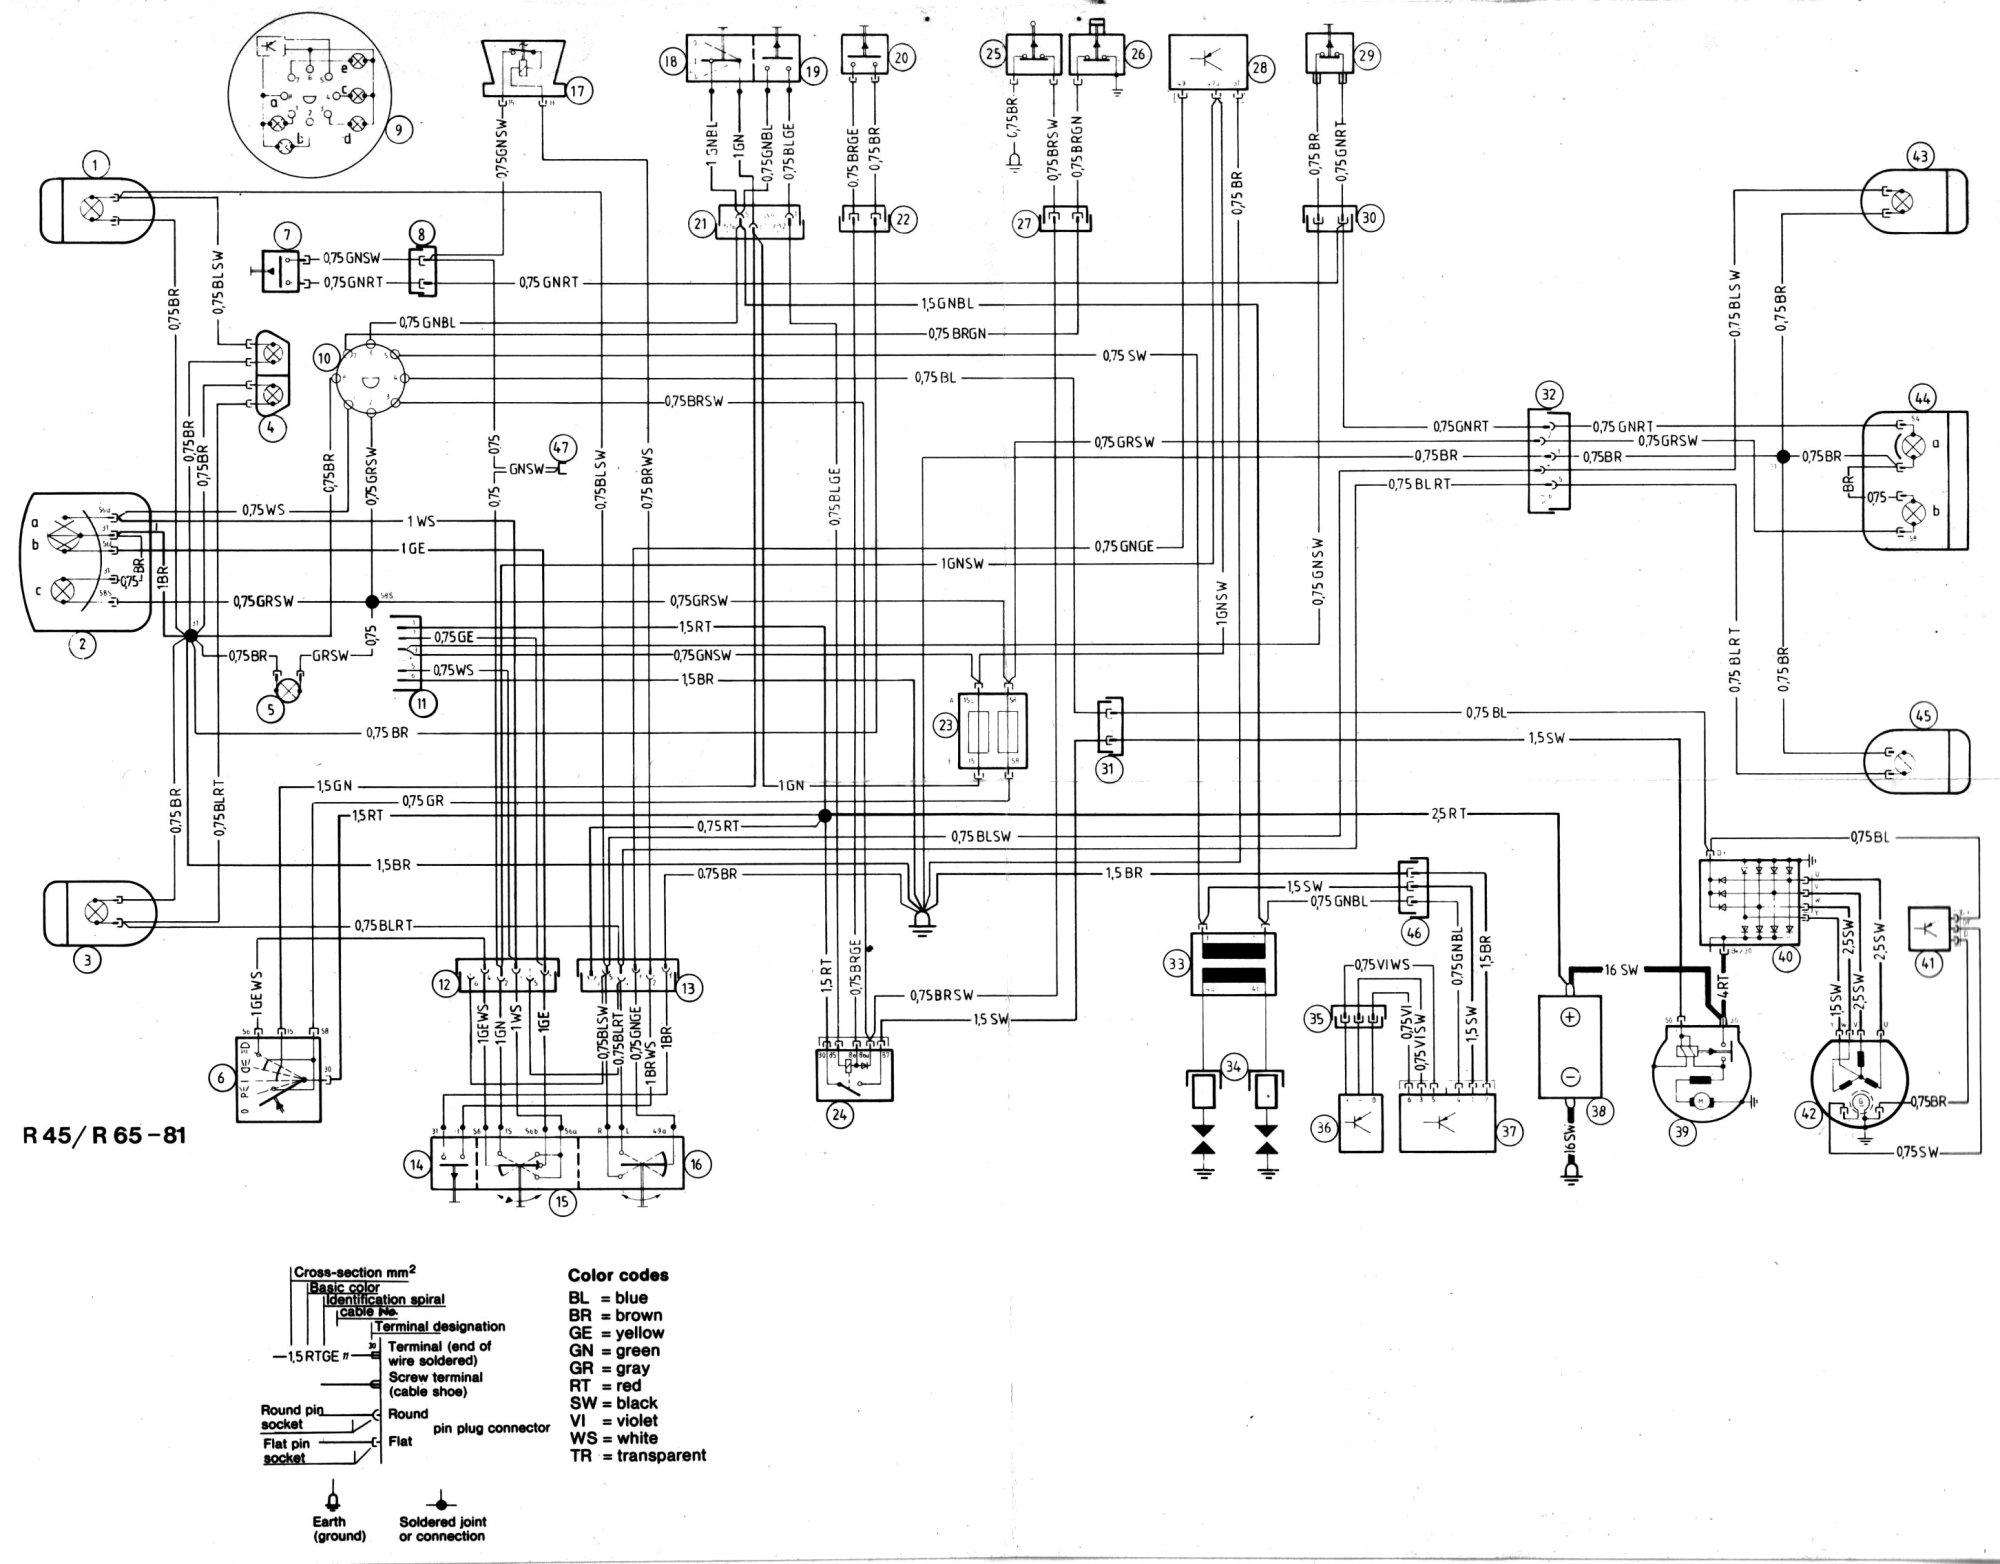 hight resolution of 2004 volvo xc90 radio wiring diagram